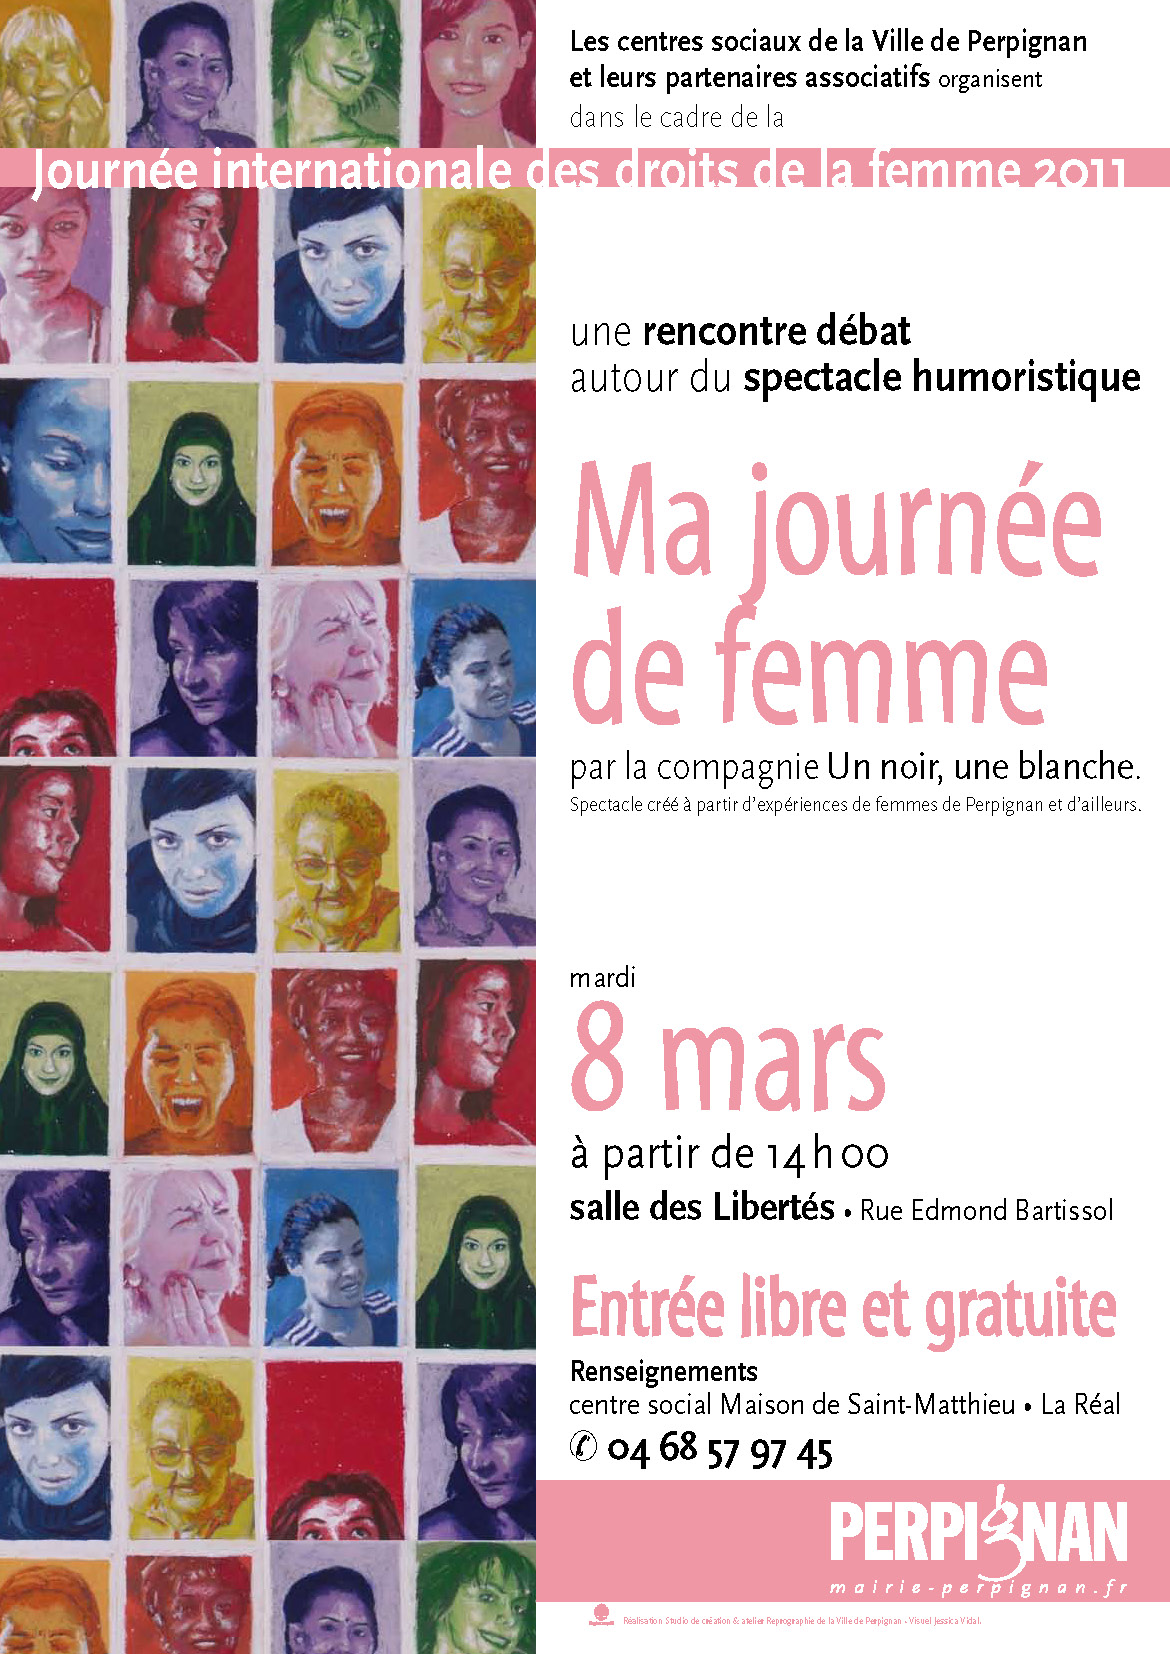 Journee_Femme